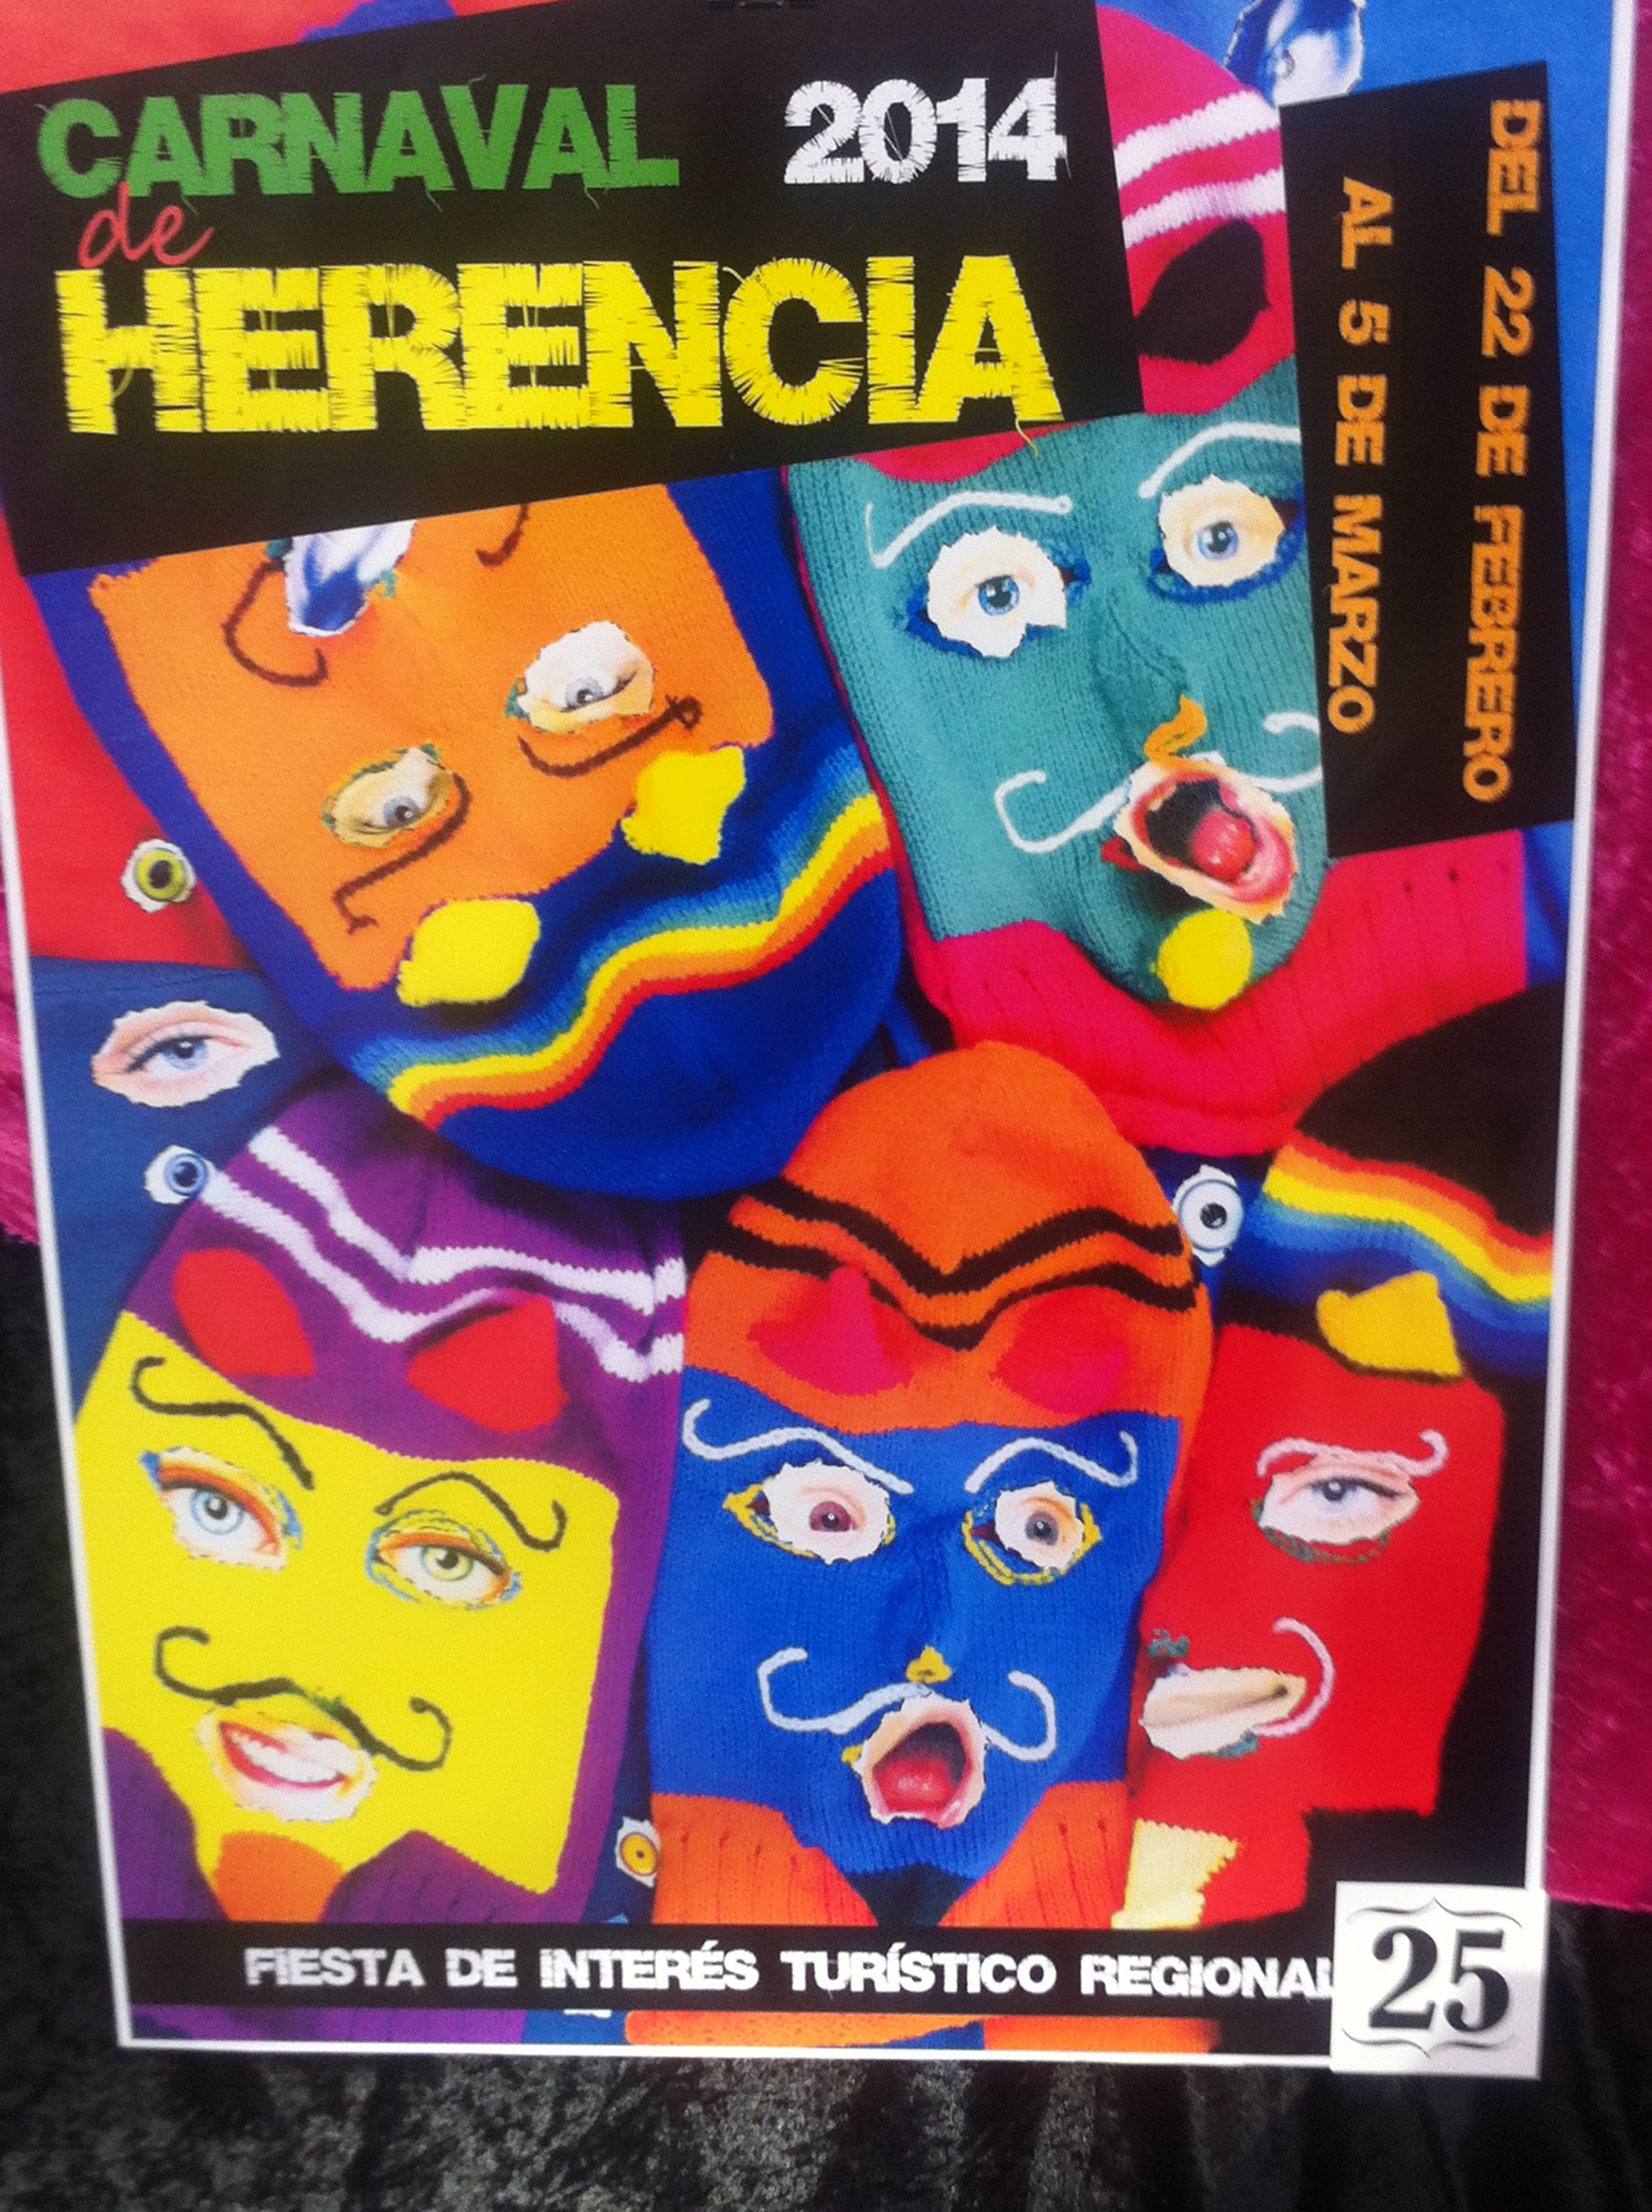 Concurso Carteles Carnaval 2014 (25)